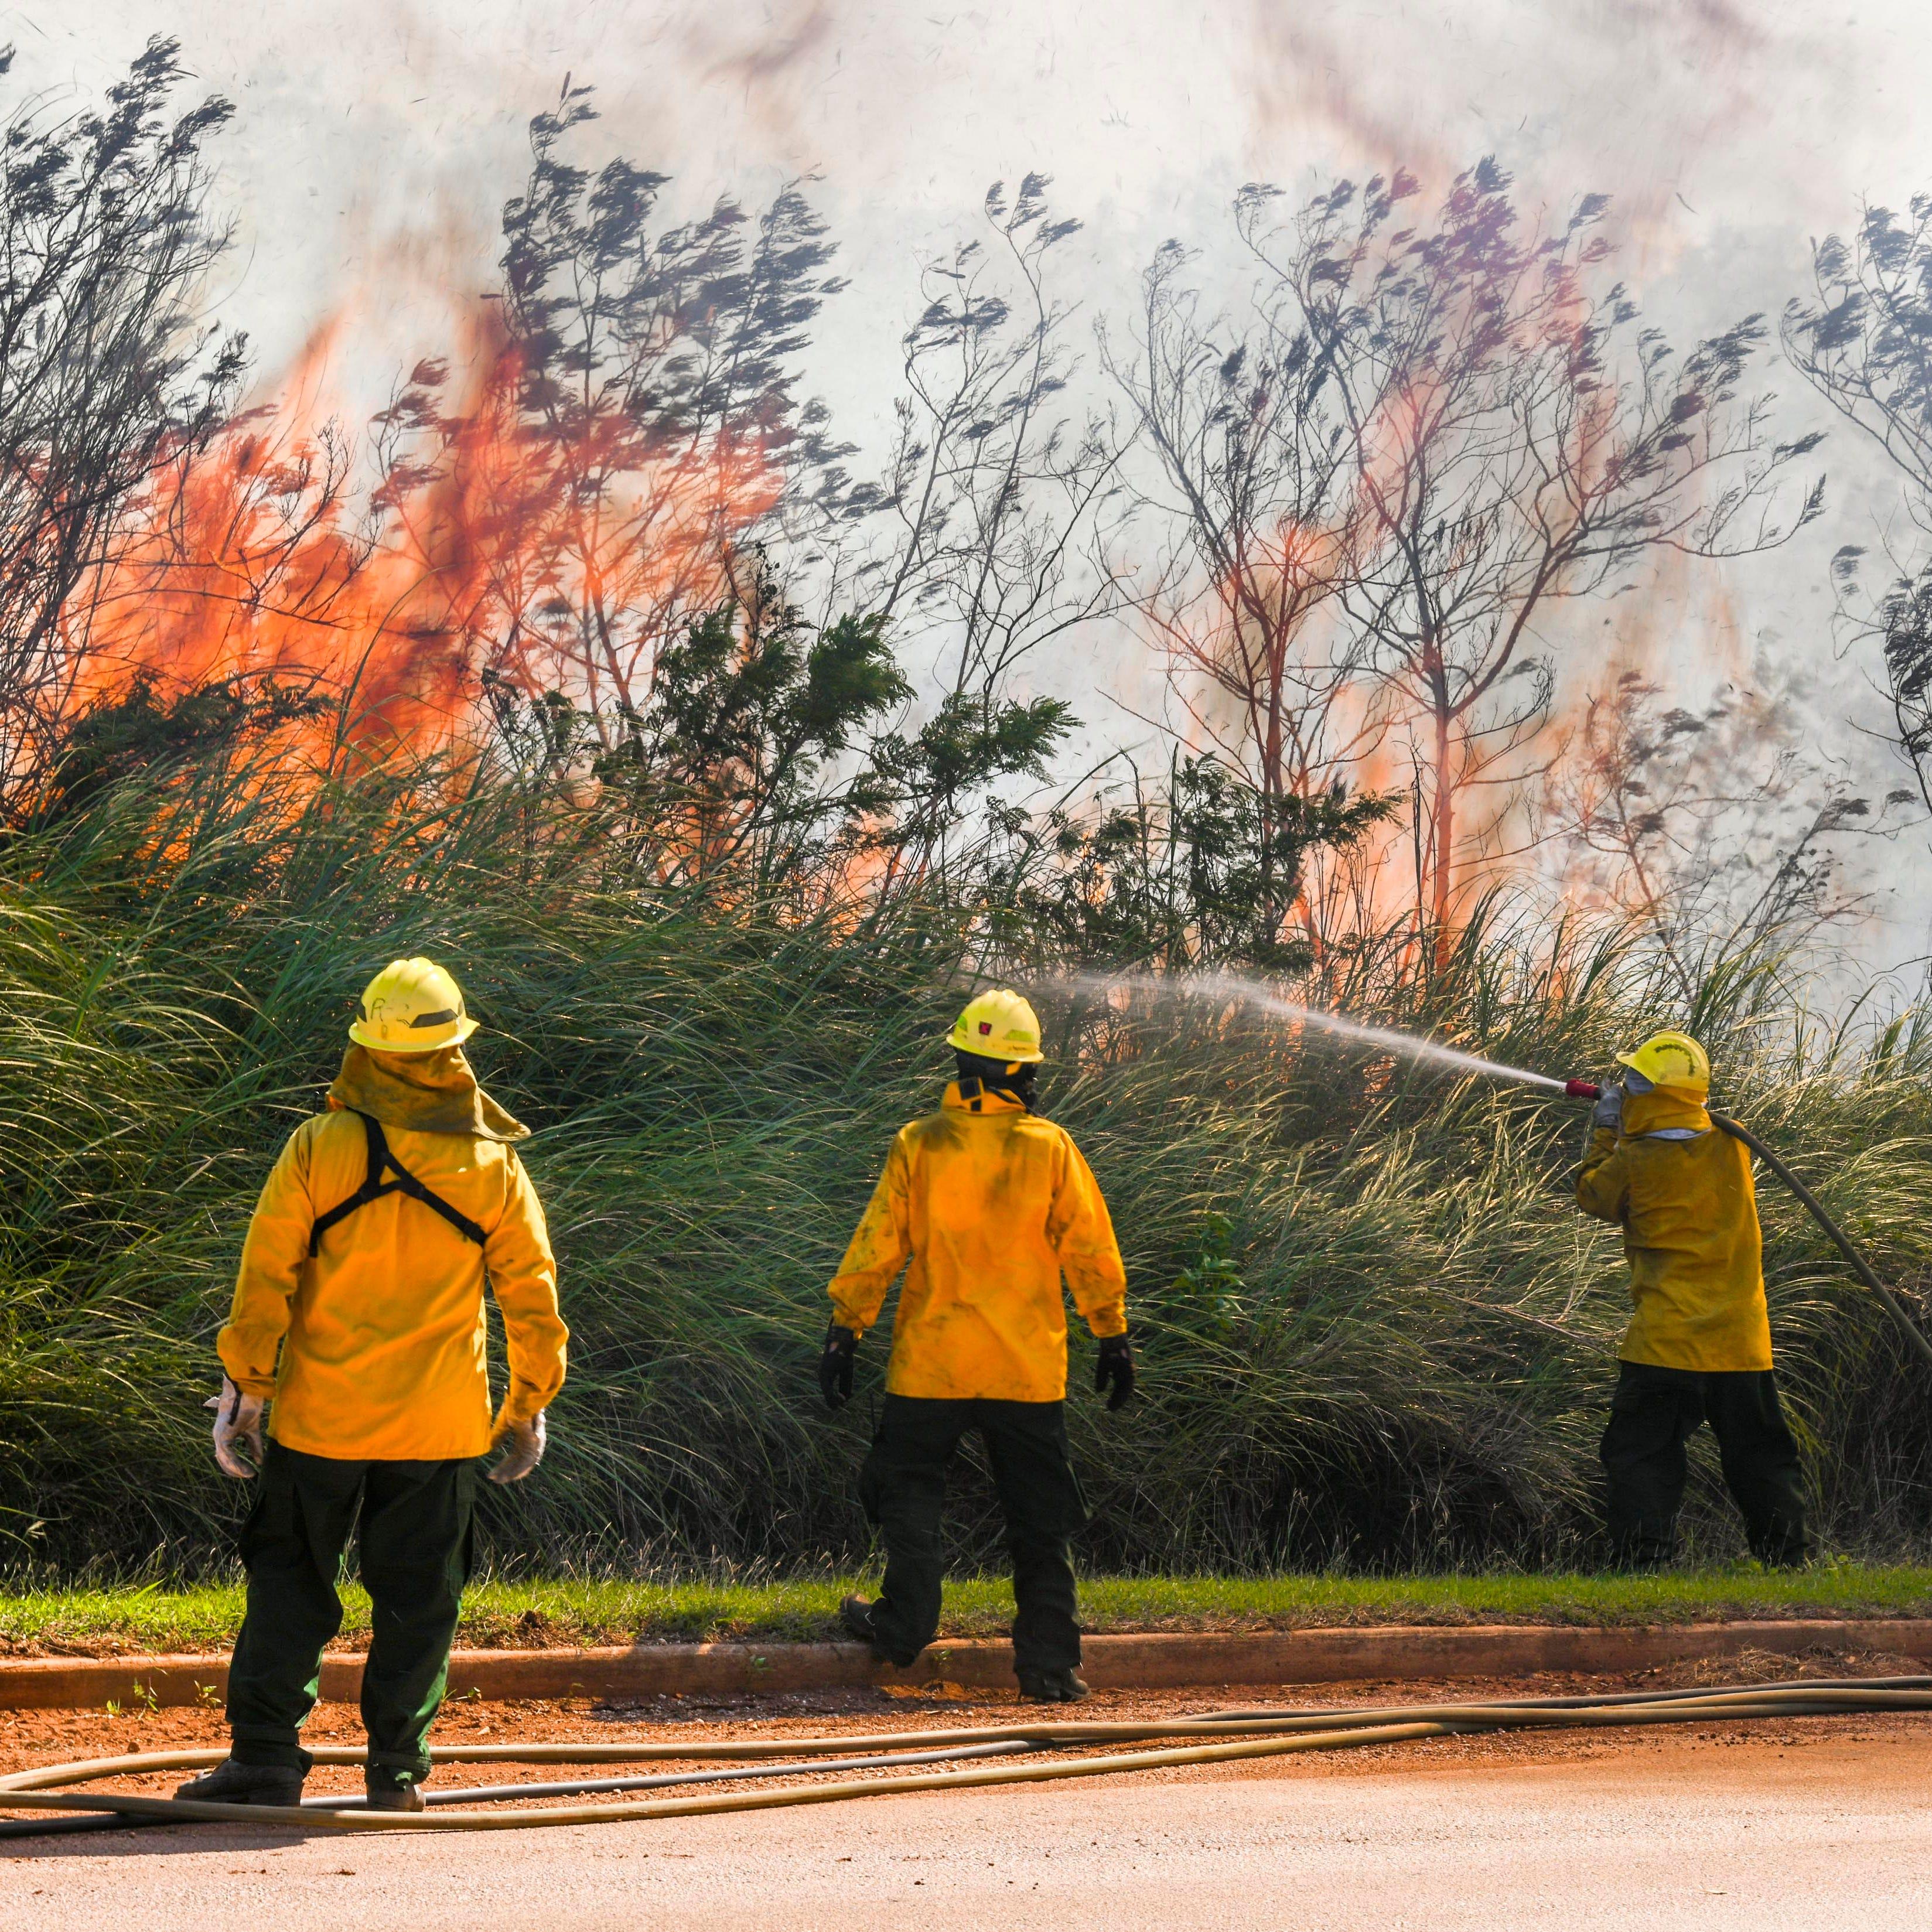 Firefighters battling grass fire in Santa Rita